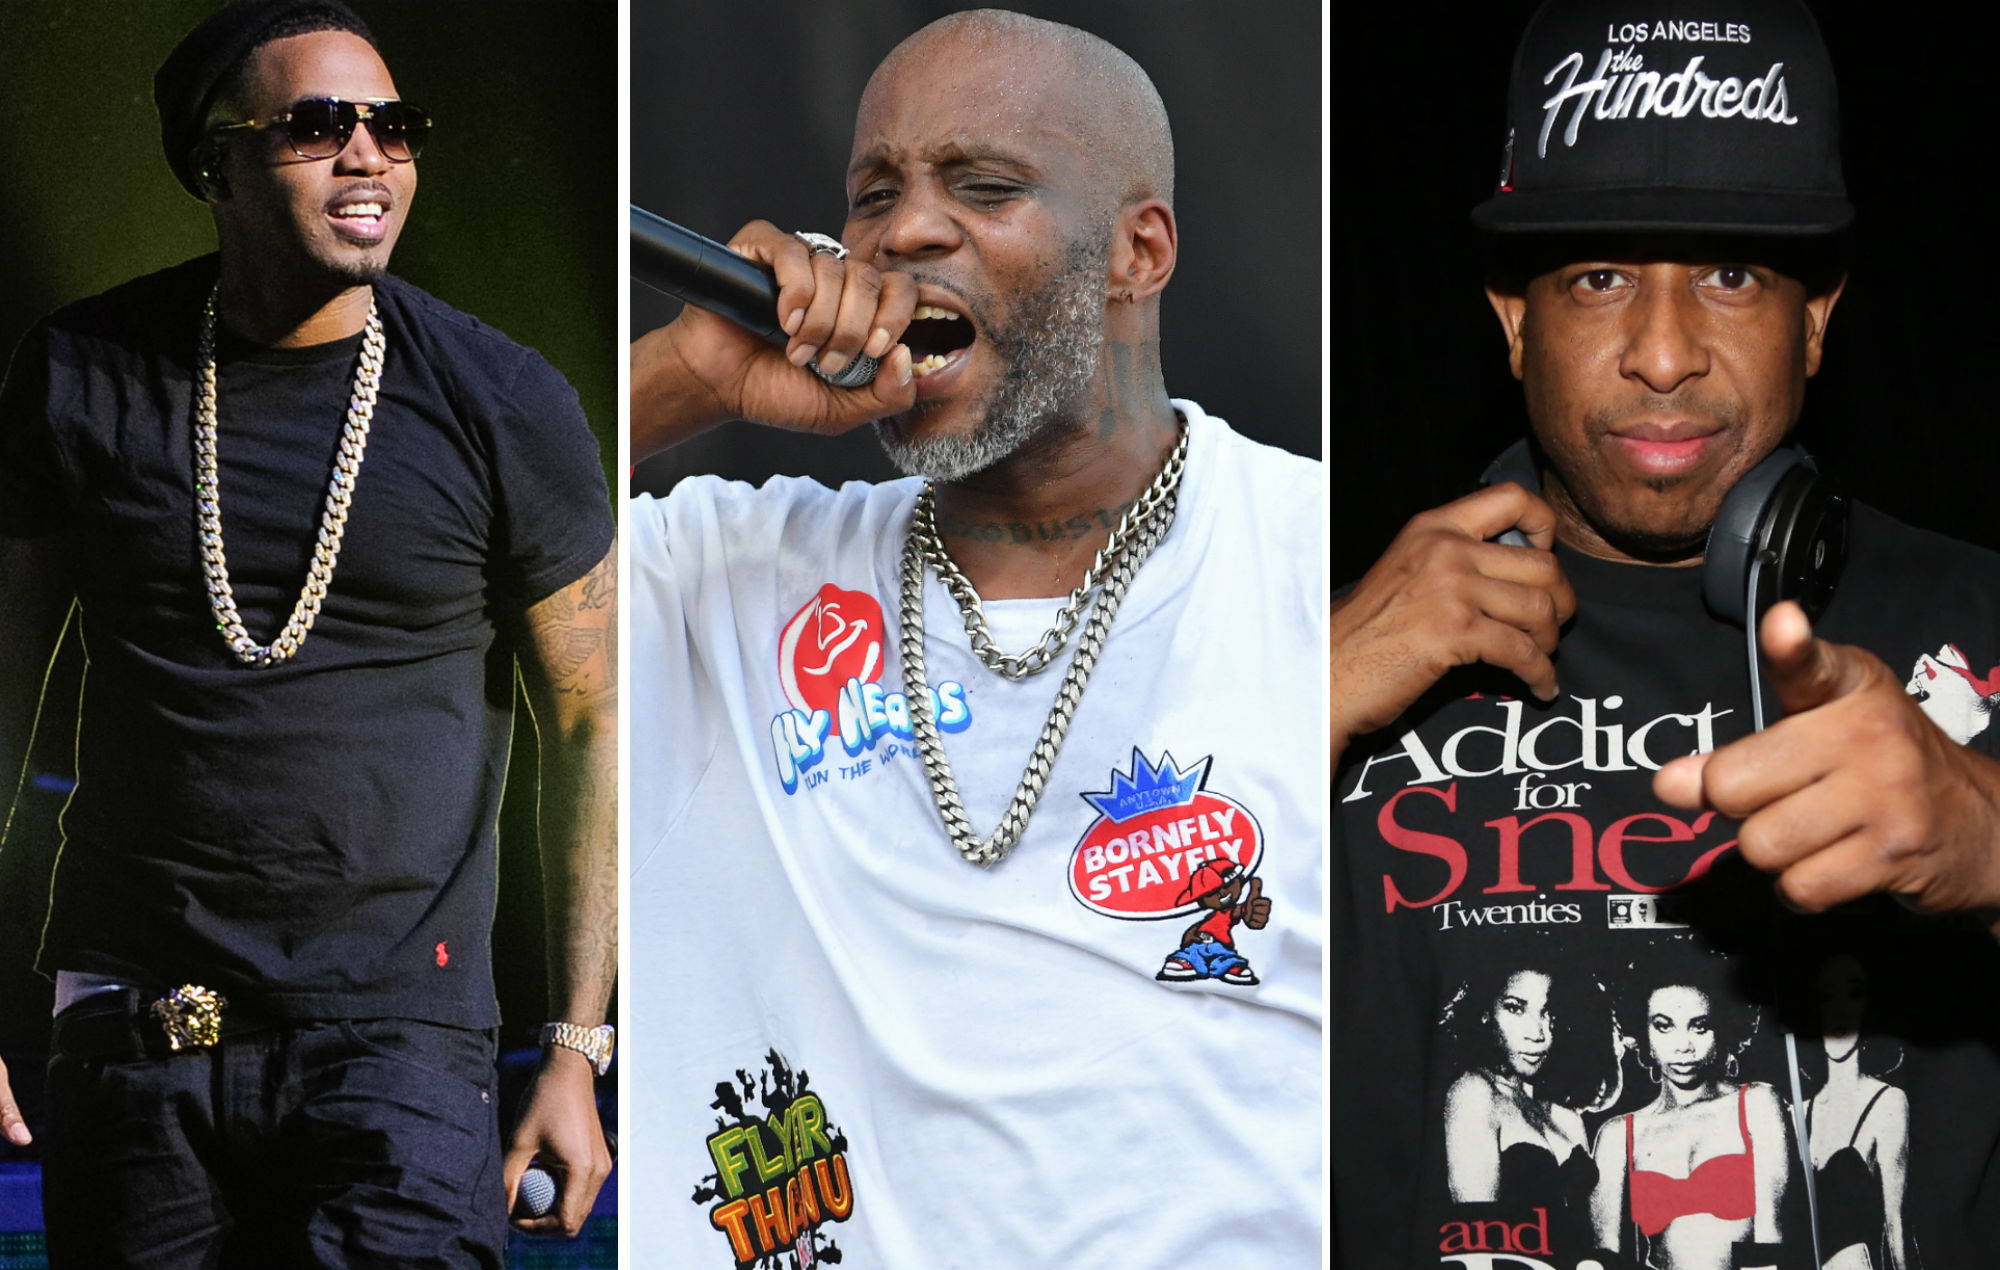 Nas, DMX and Gang Starr team up for Gods of Rap II UK tour